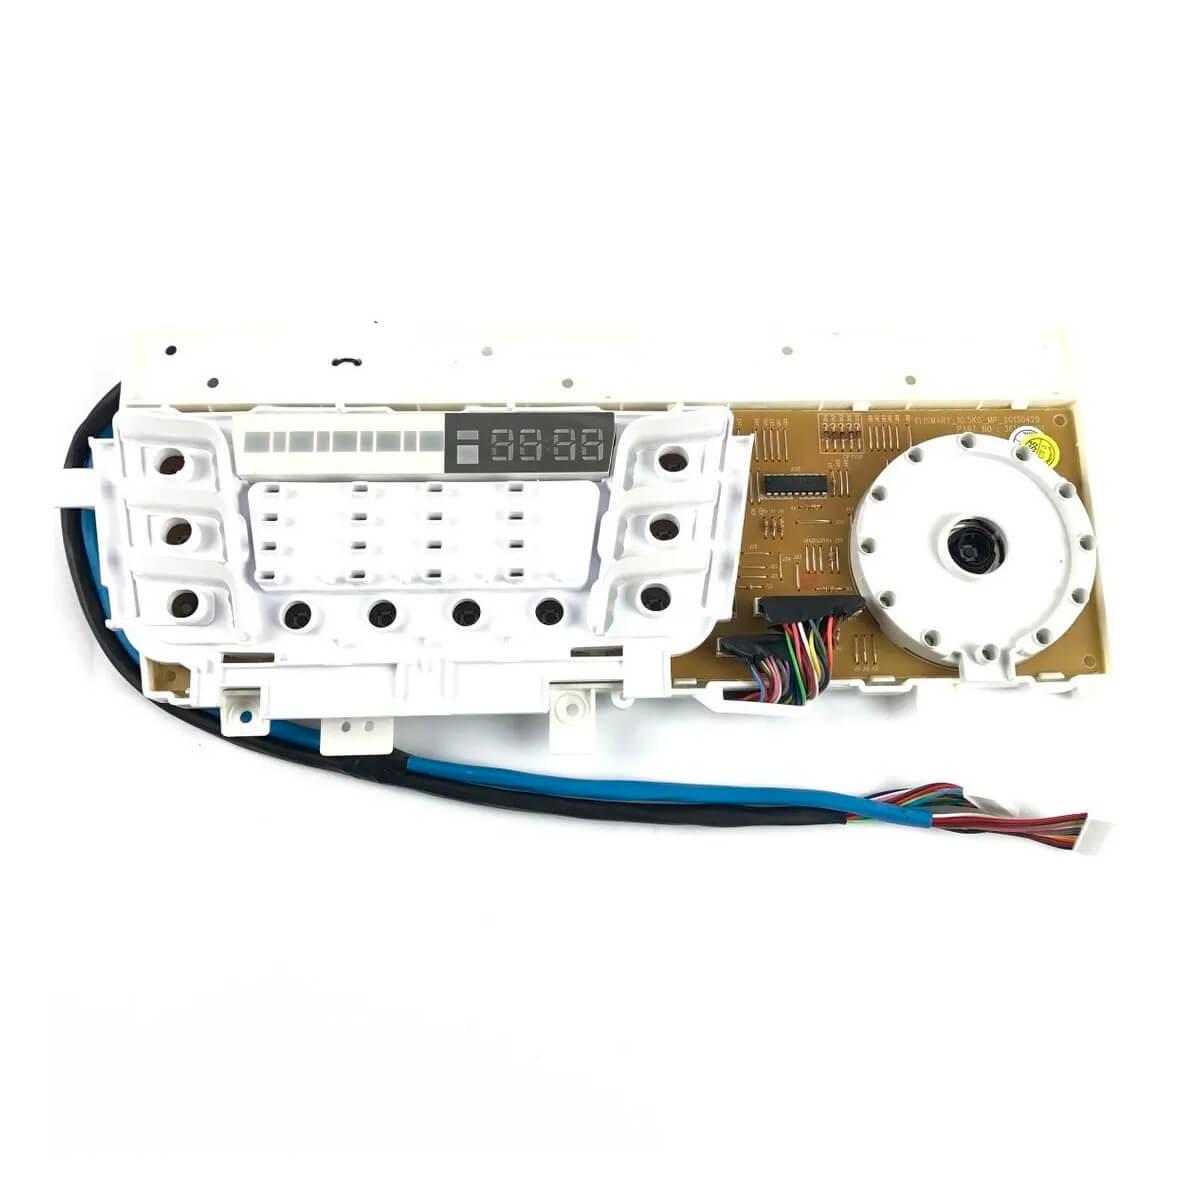 Placa De Interface Completa Para Lava e Seca Electrolux LSI11 - PRPSSWLE10 / A07895201